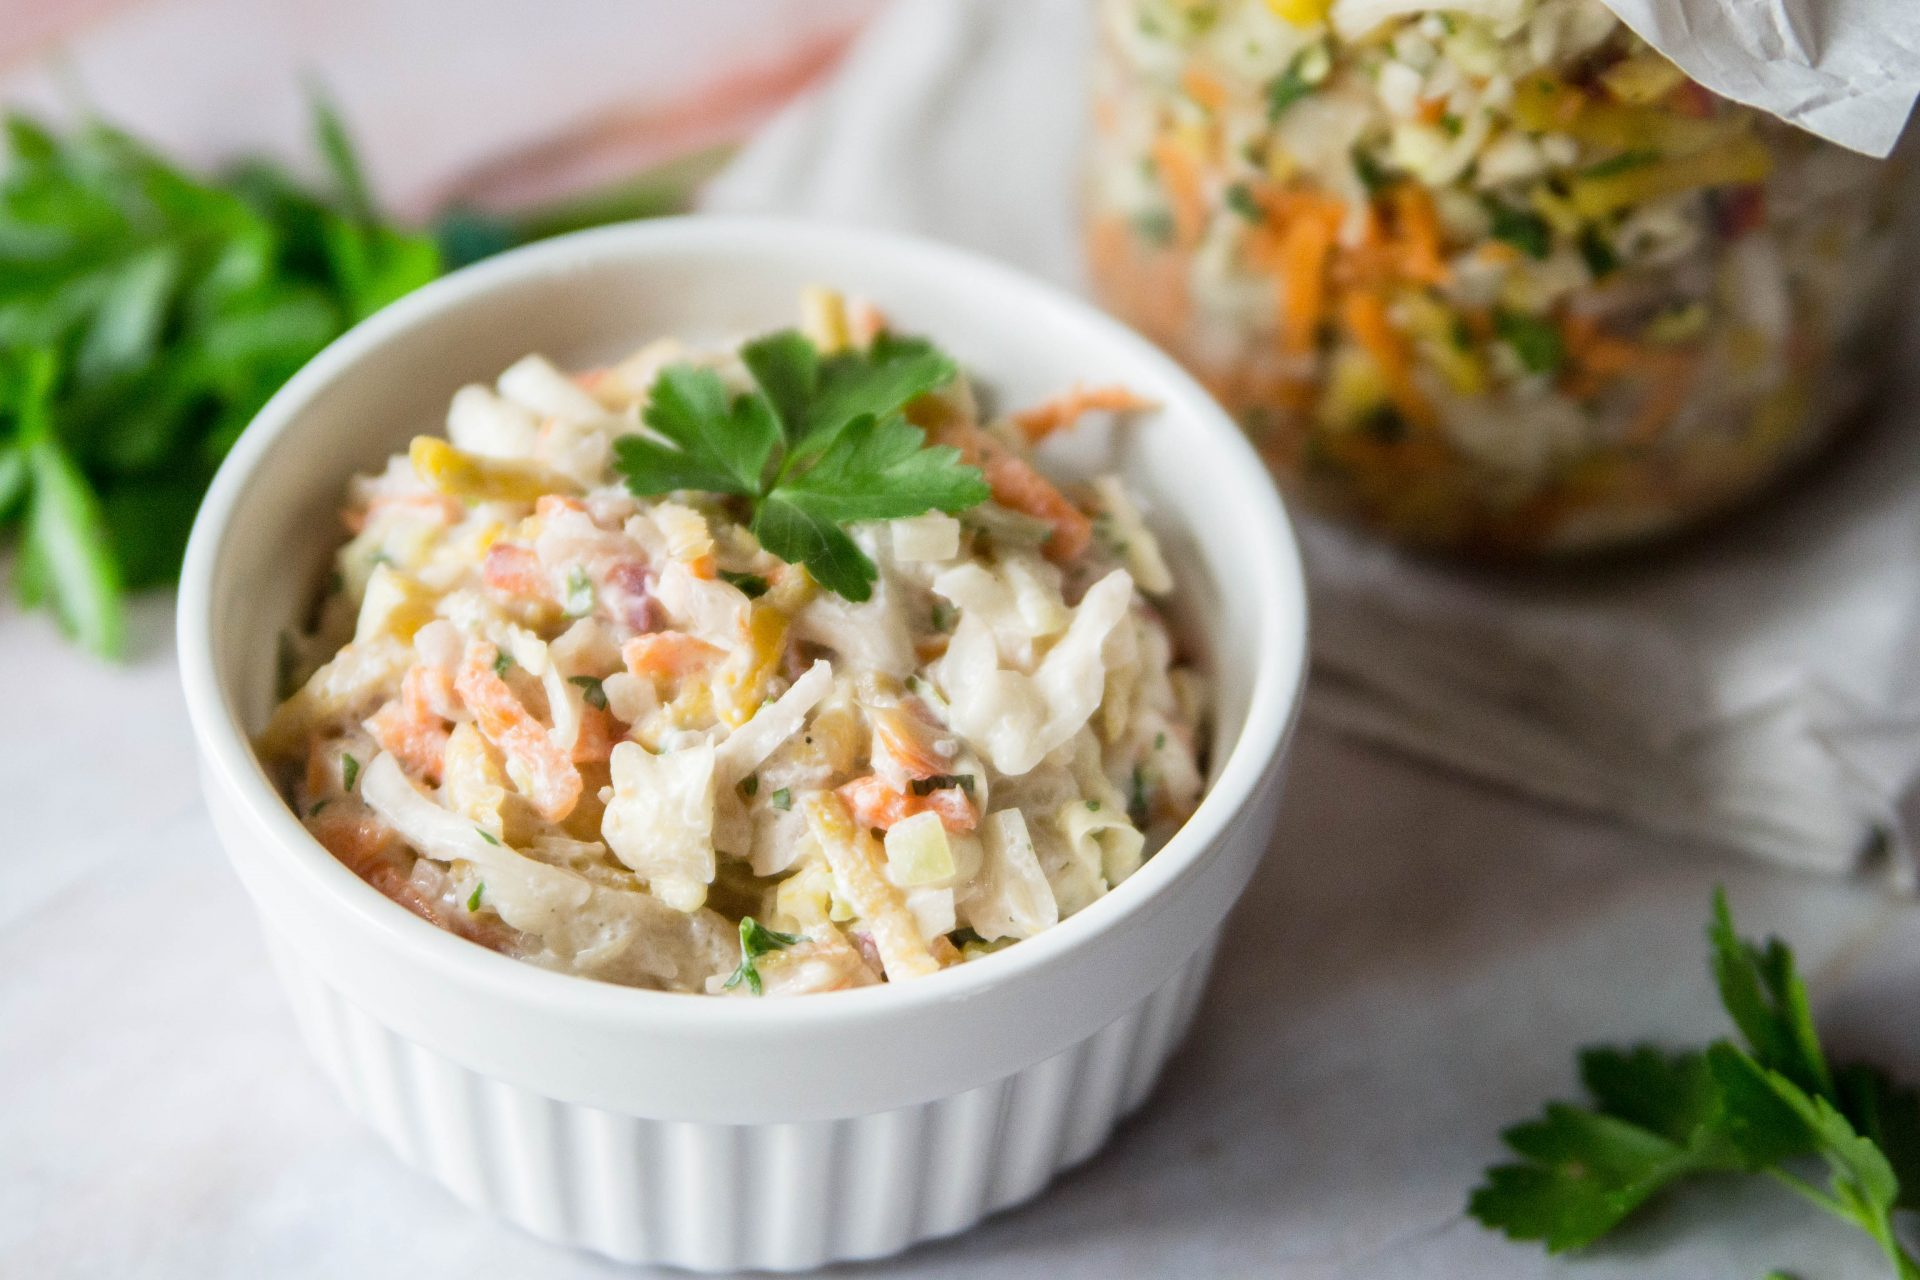 Weißkraut-Karotten-Salat aus dem Glas